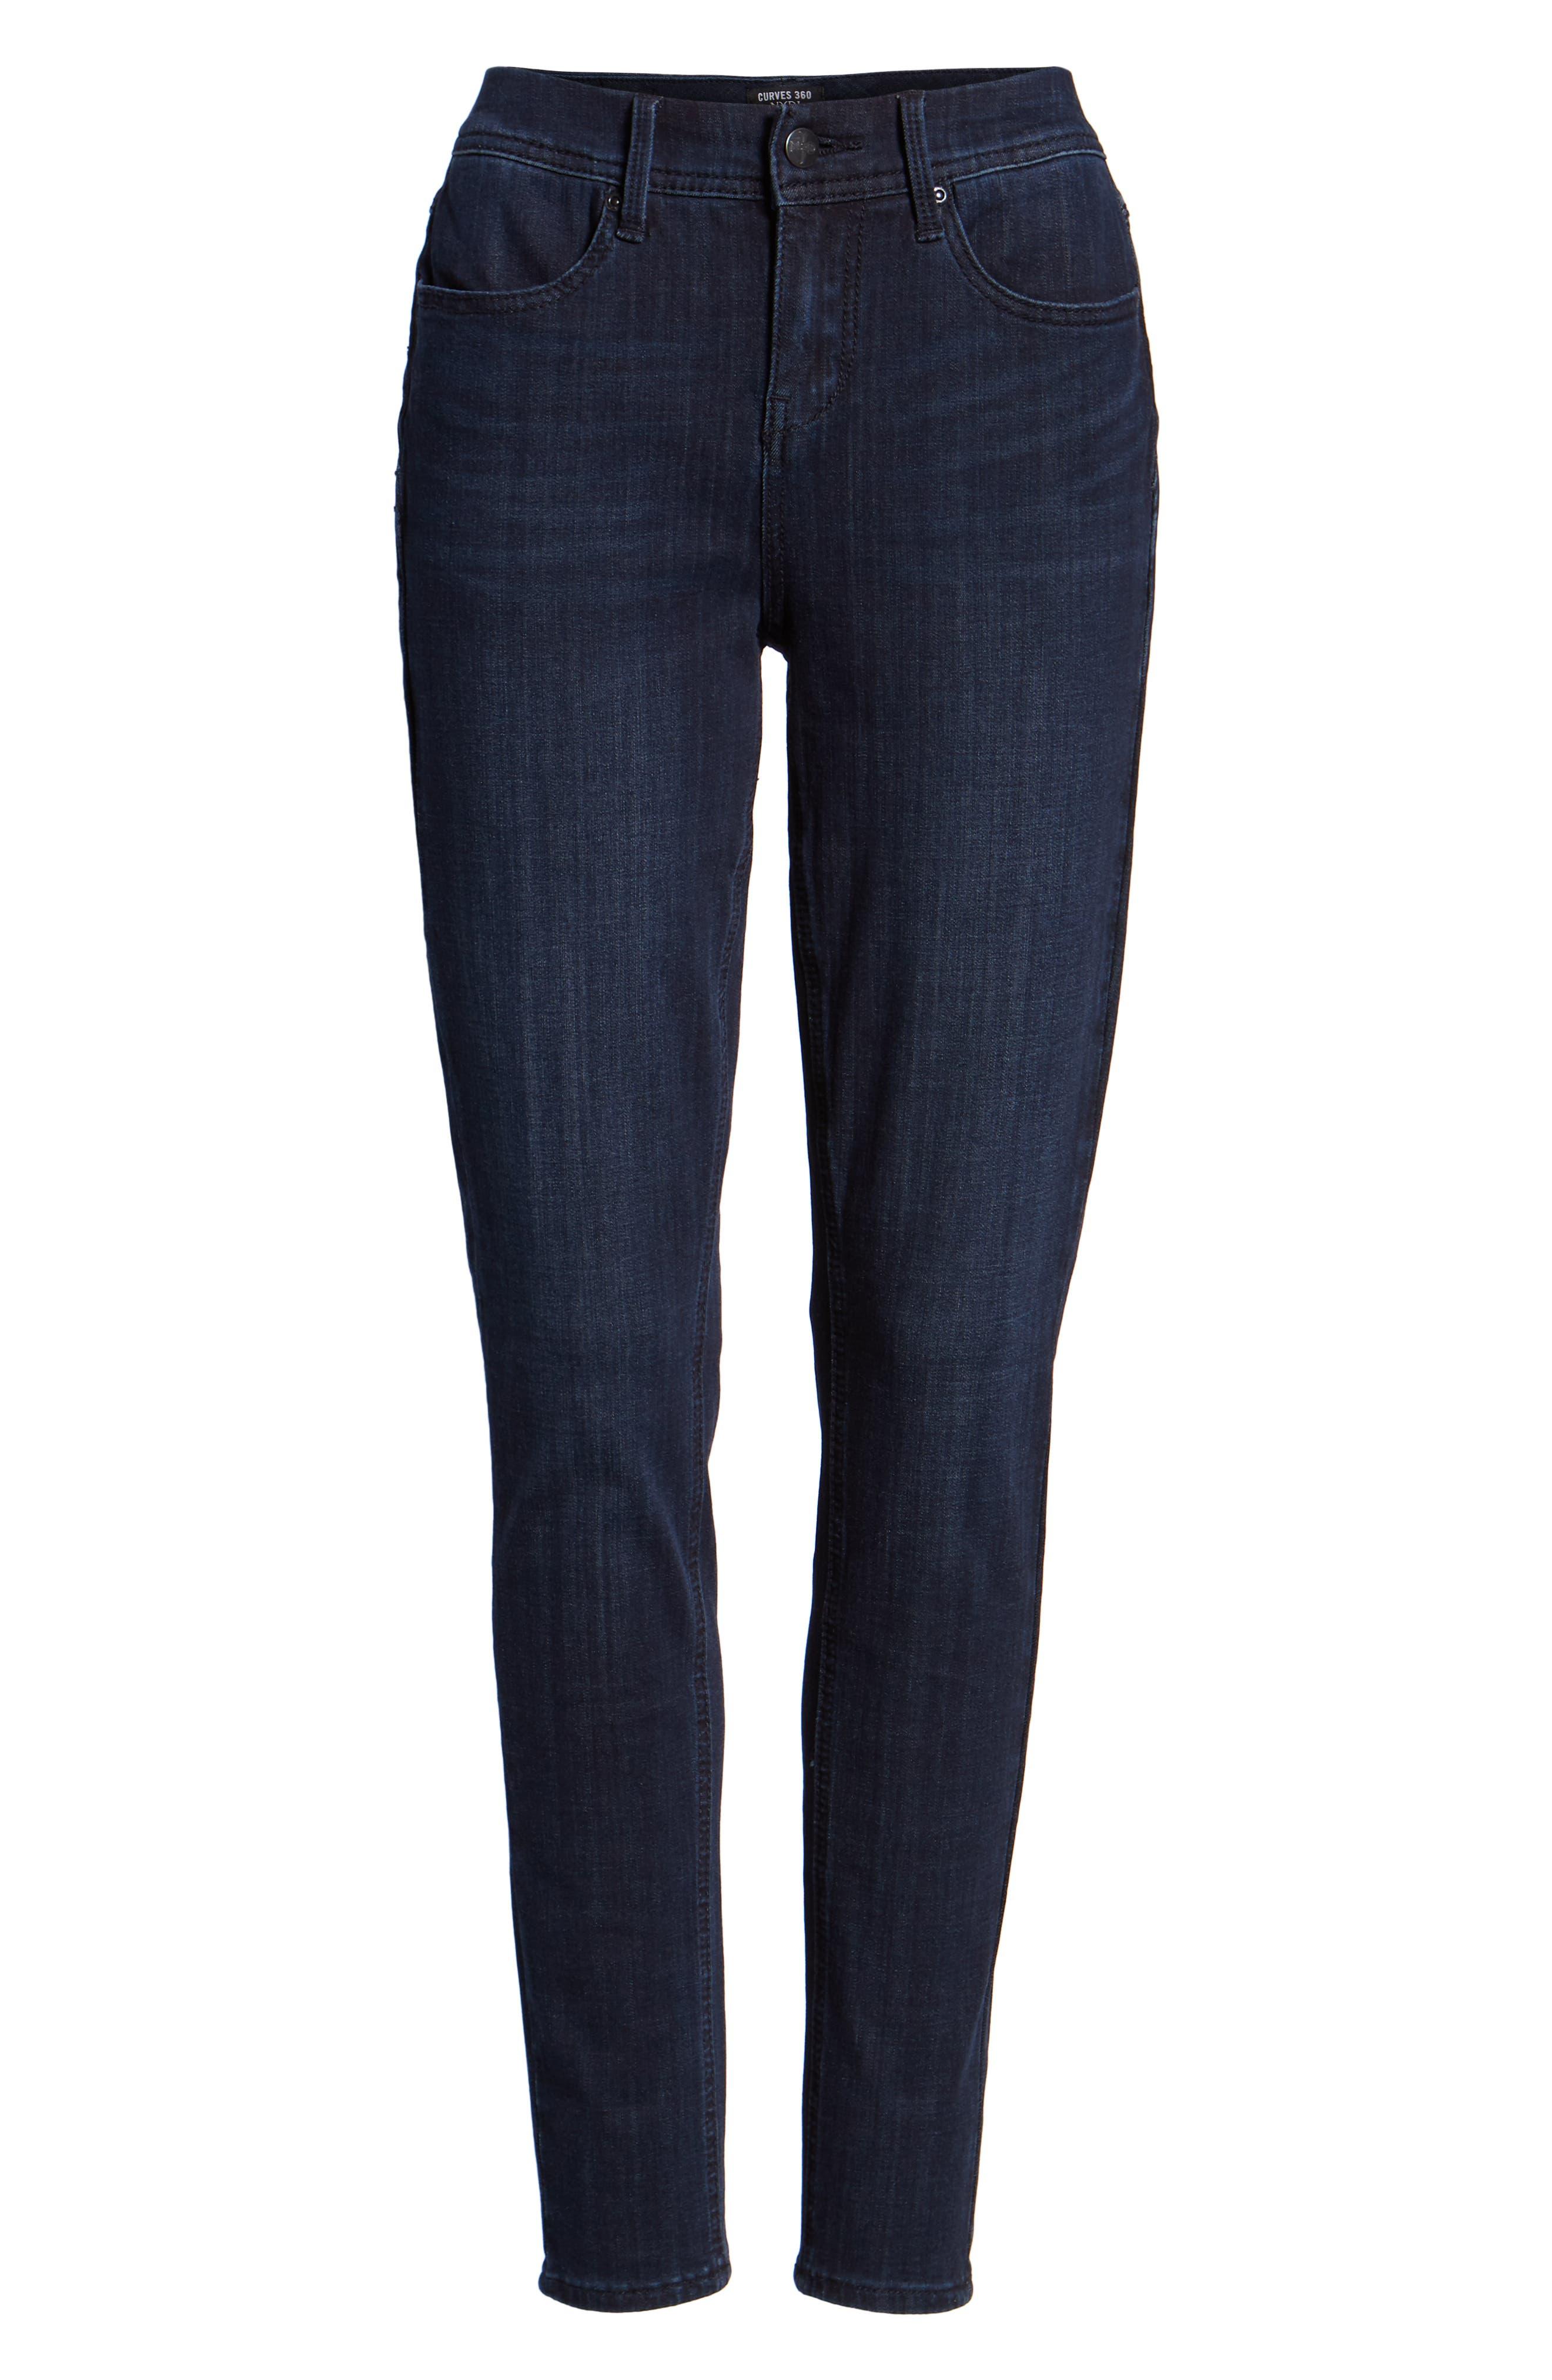 Skinny Jeans,                             Alternate thumbnail 4, color,                             JULIUS